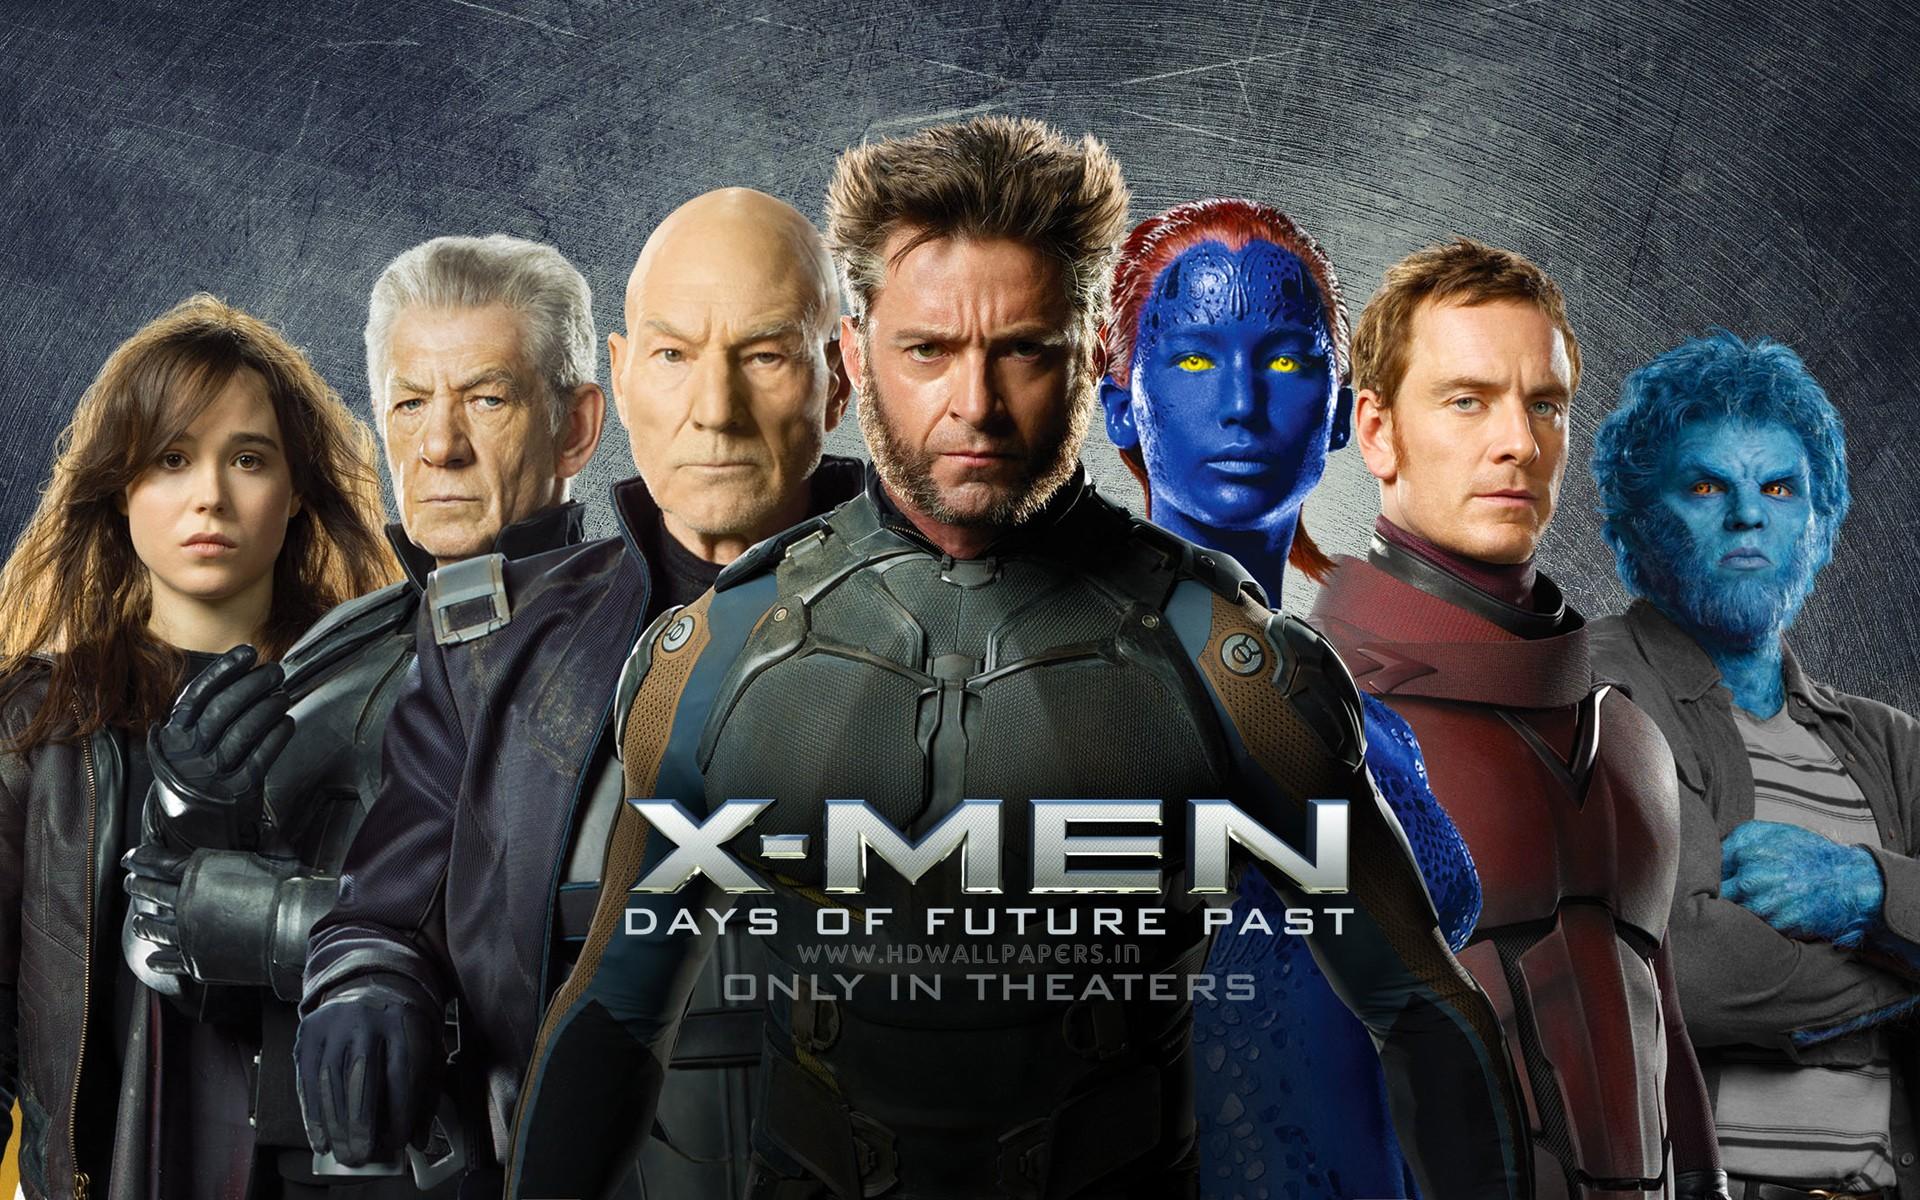 People 1920x1200 X-Men: Days of Future Past Wolverine Magneto Beast (character) Mystique Charles Xavier movies Patrick Stewart Ian McKellen Ellen Page Michael Fassbender Kitty Pryde